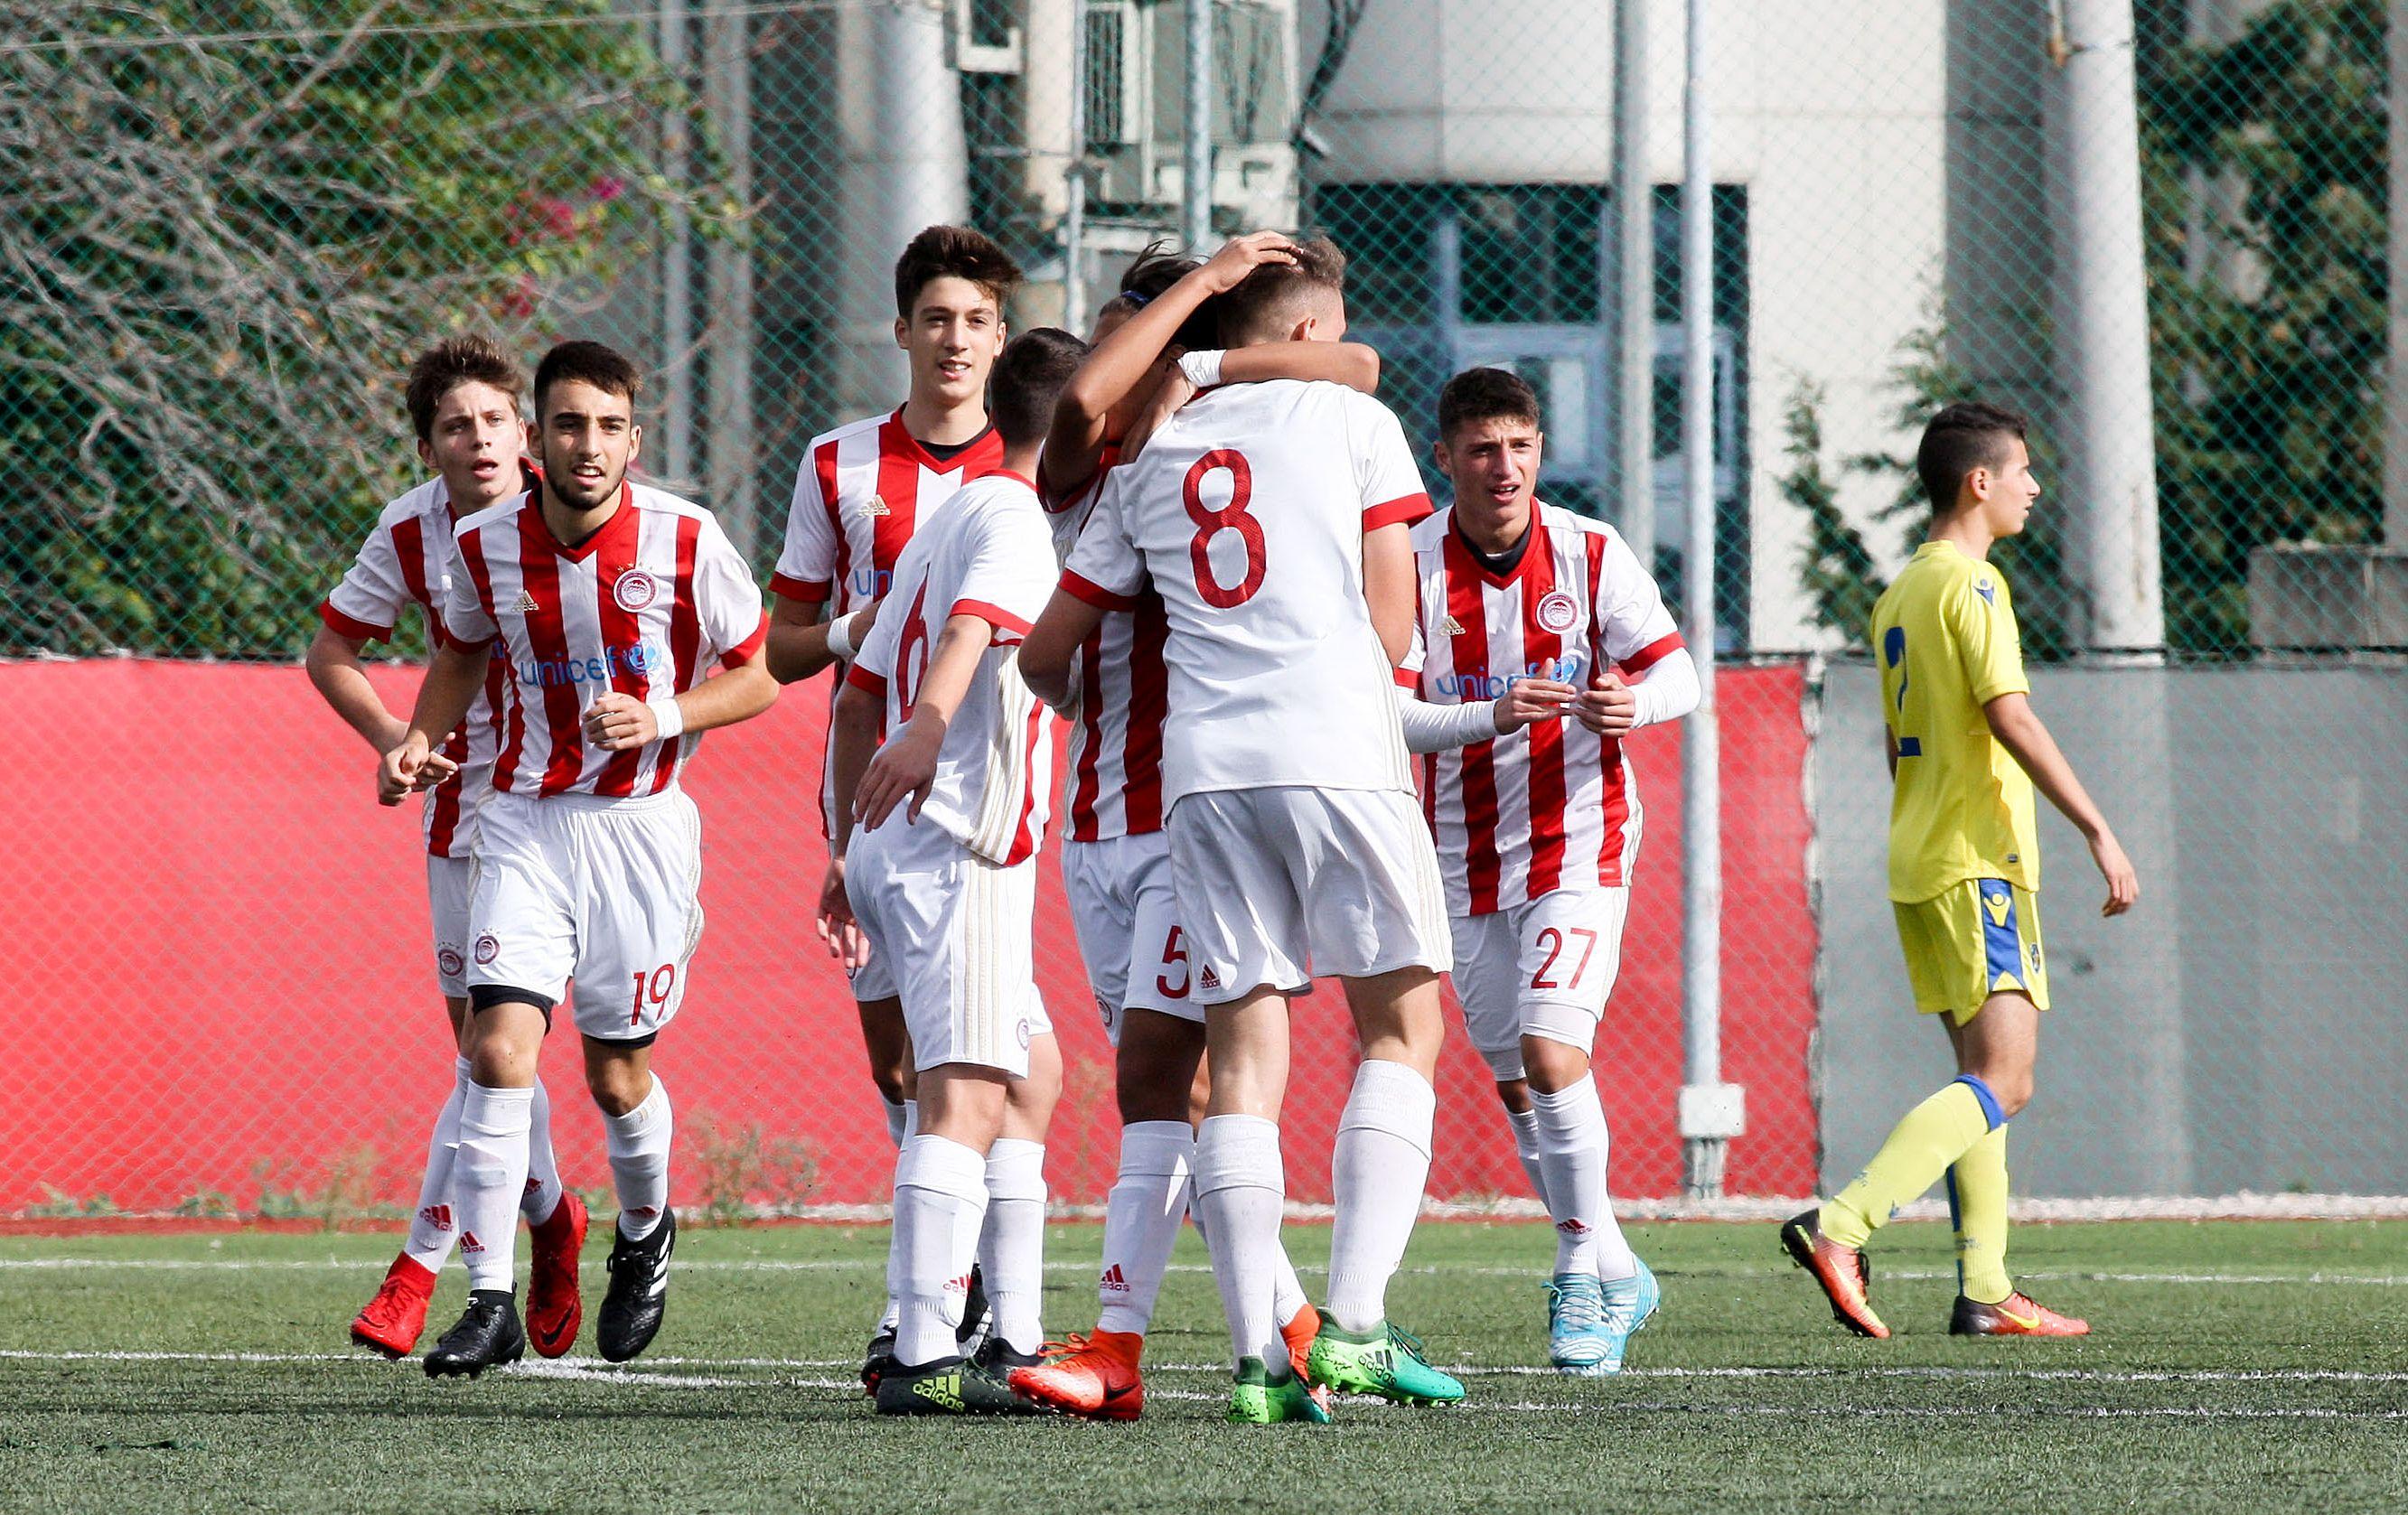 SL K-15: Αστέρας Τρίπολης-Ολυμπιακός 0-1